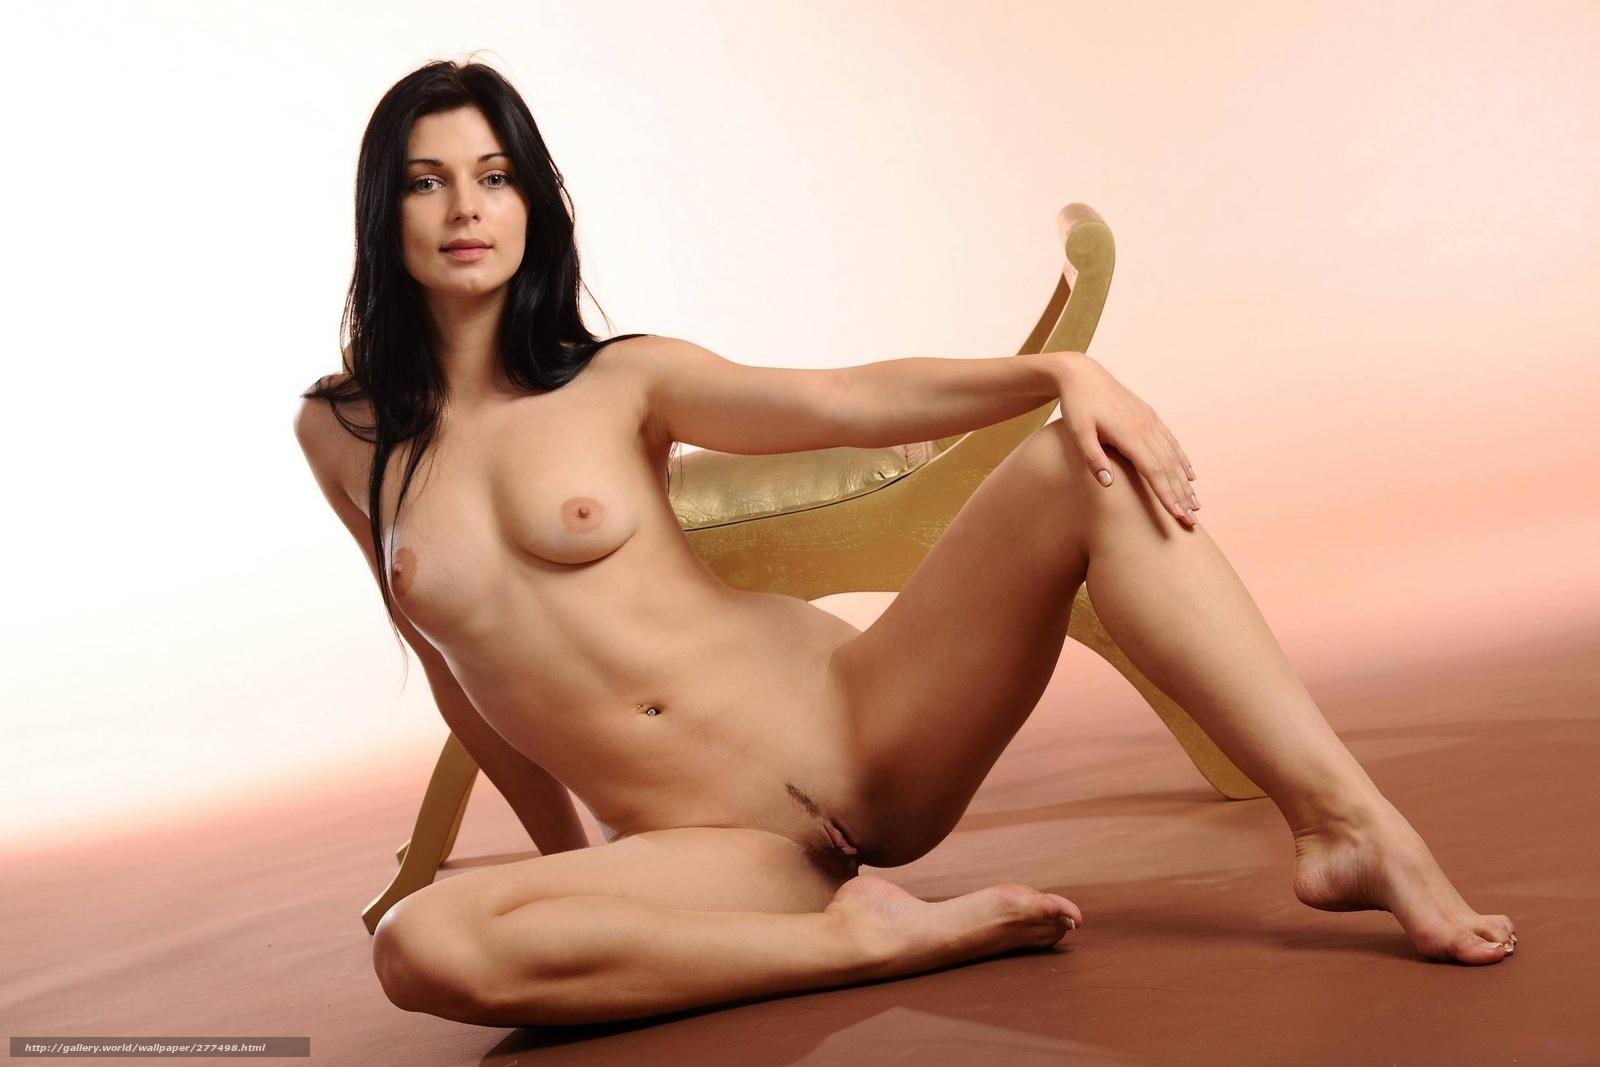 eroticheskie-fotogalerei-s-obnovleniem